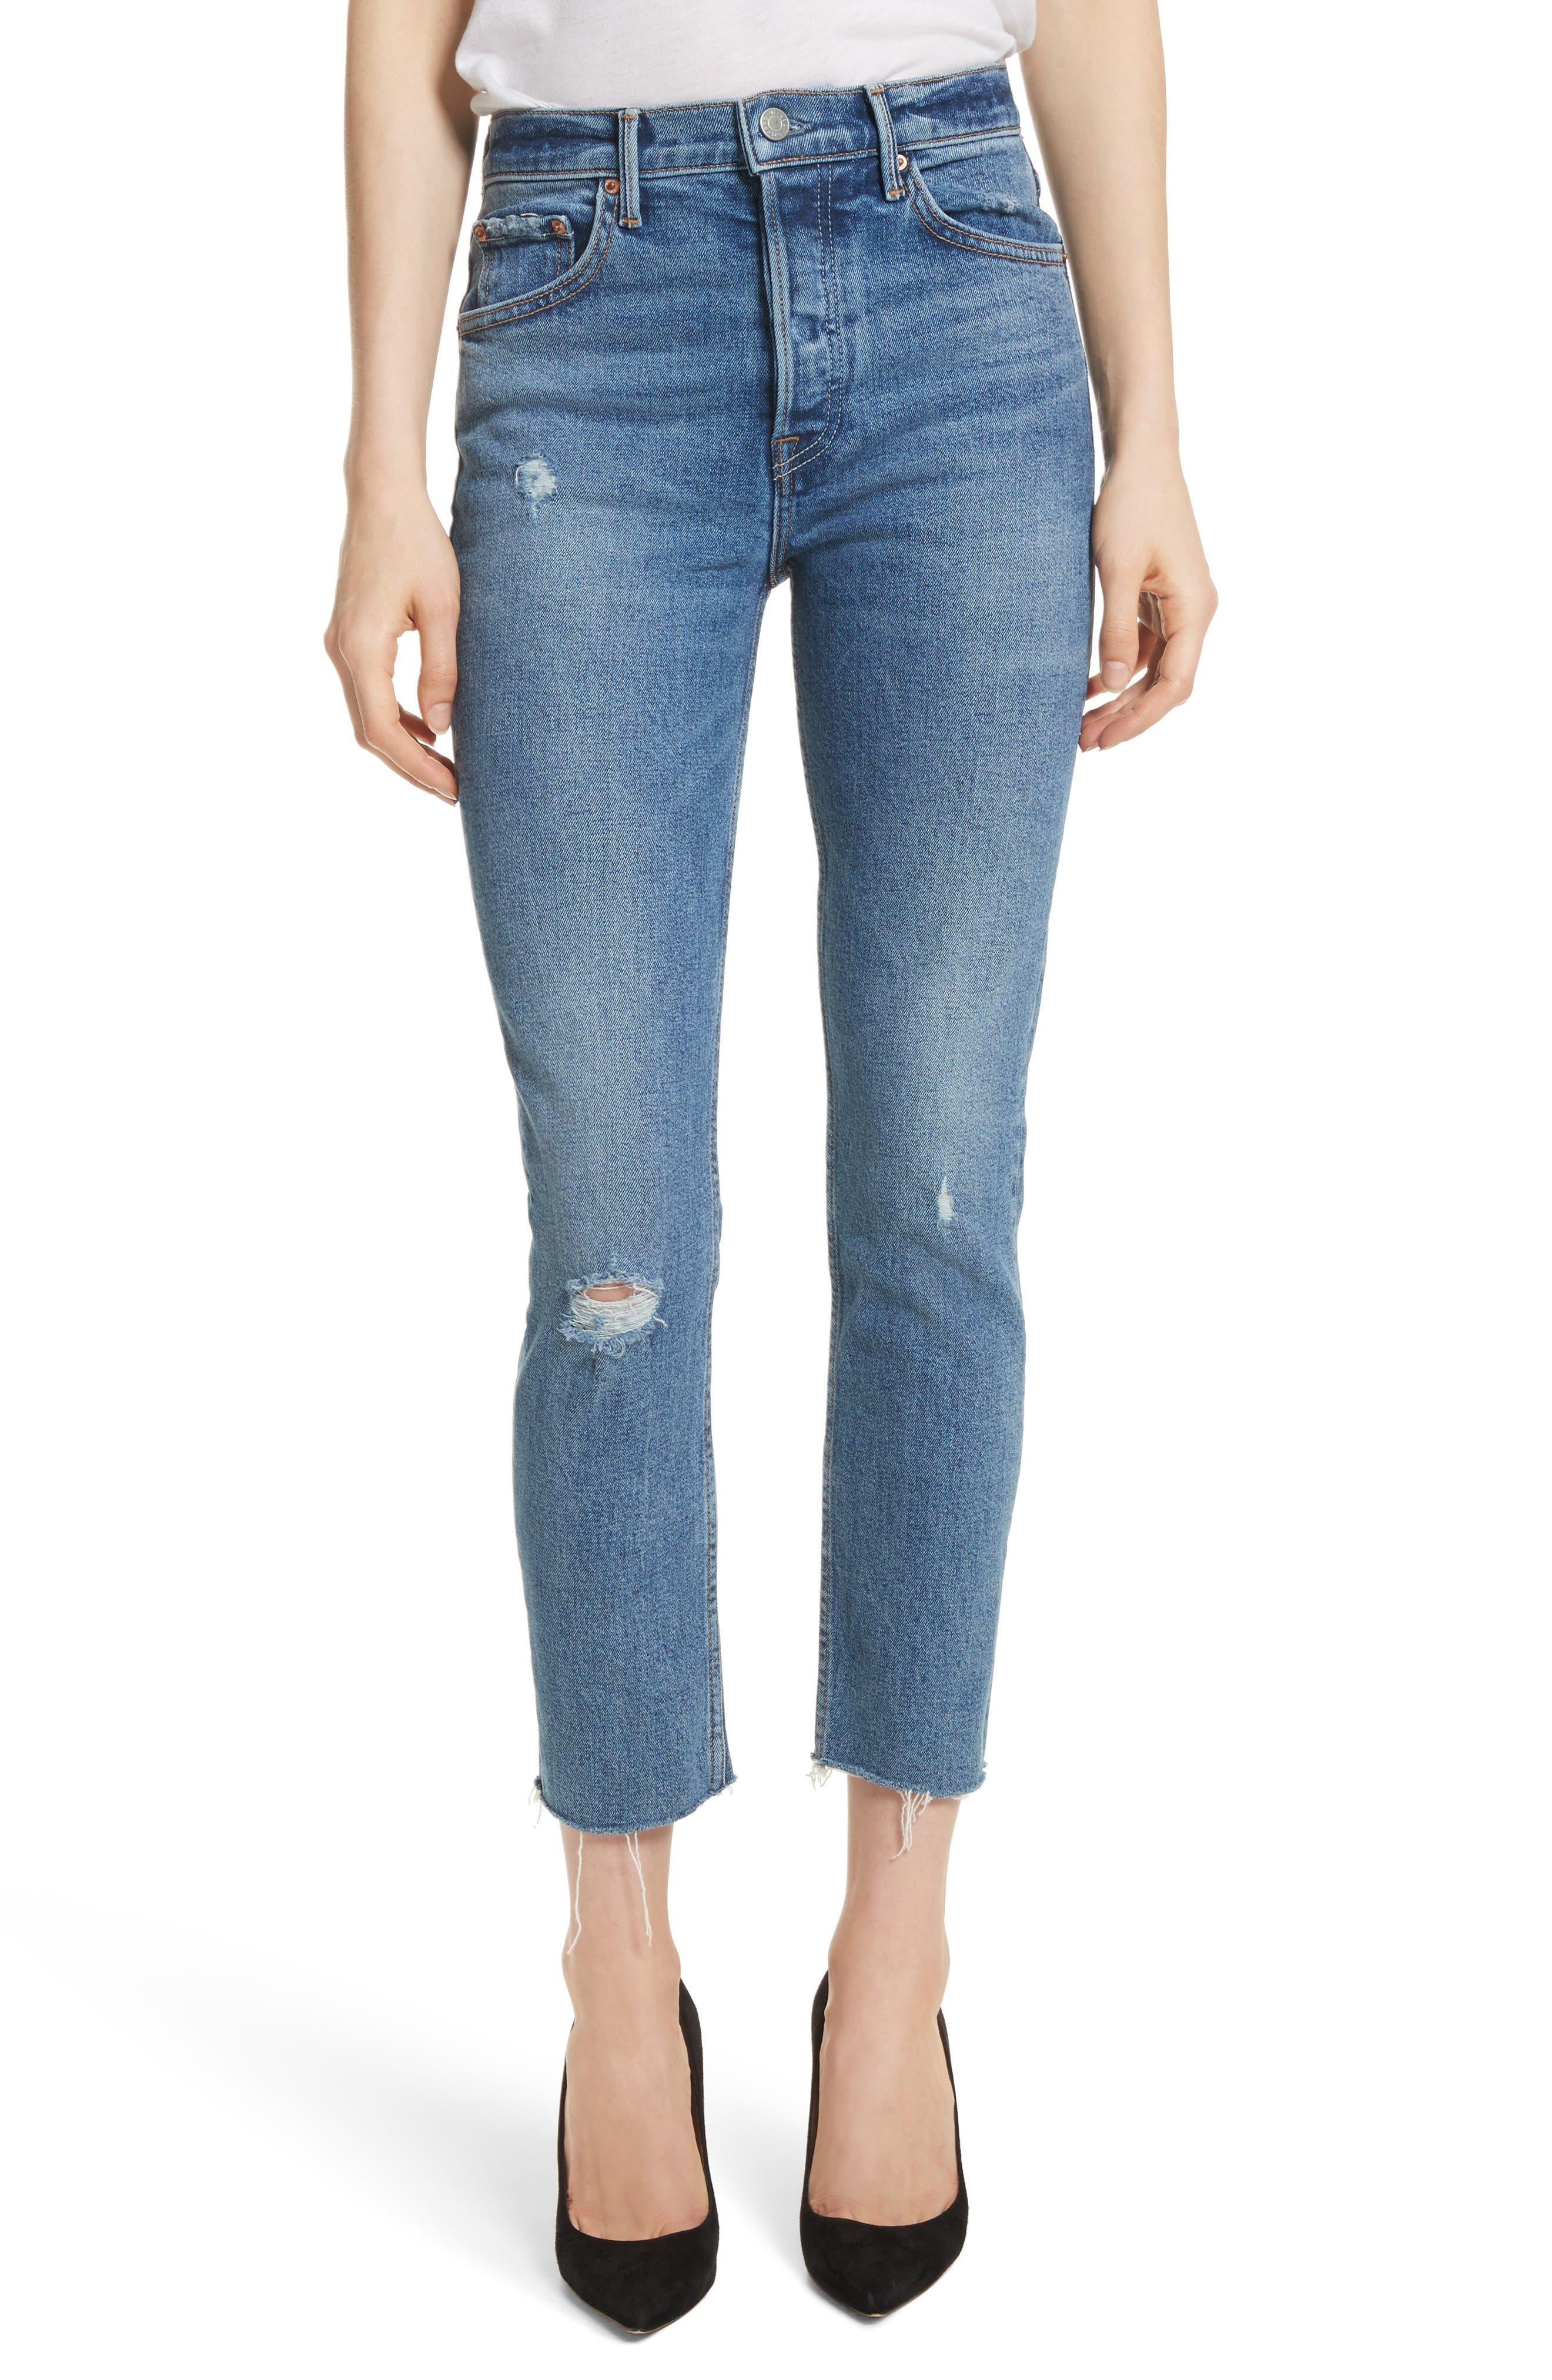 GRLFRND, Karolina High Waist Skinny Jeans, Main thumbnail 1, color, SIXPENCE